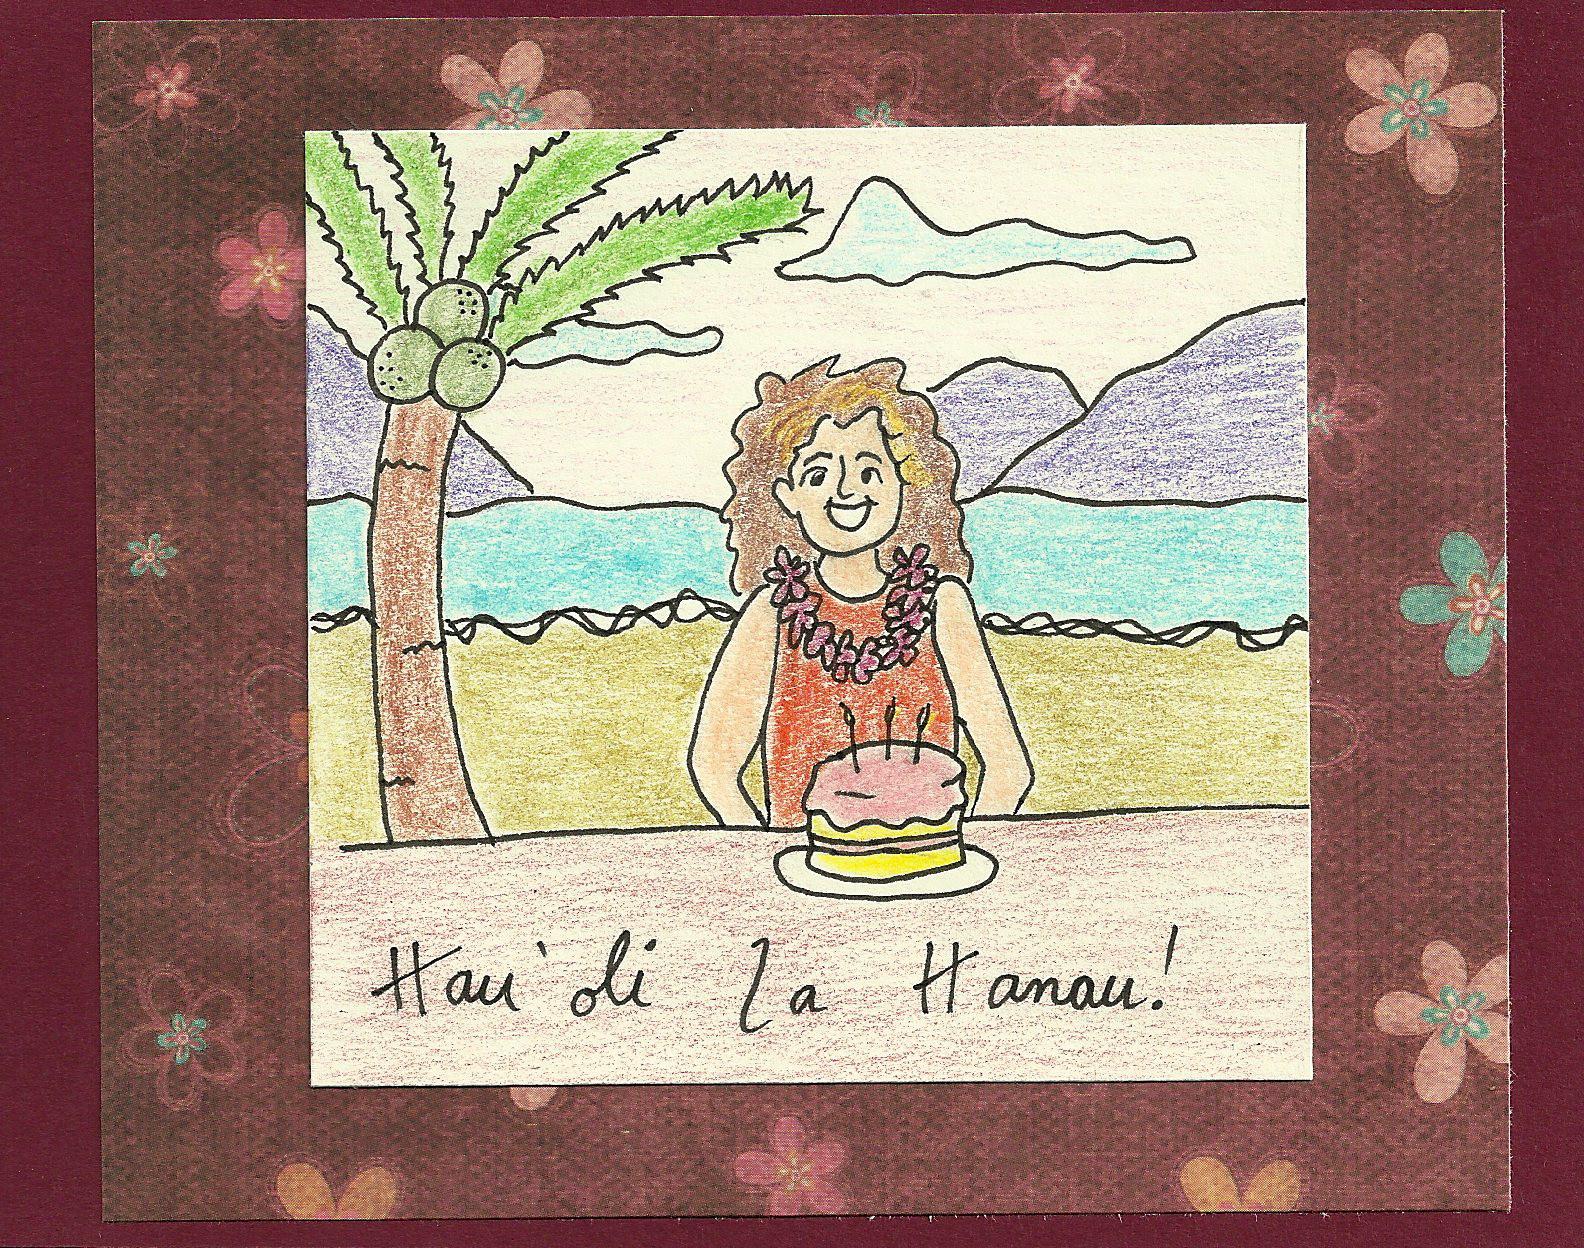 Best ideas about Hawaiian Birthday Wishes . Save or Pin Debbie Dots Greeting Card Blog Hawaiian Birthday Now.